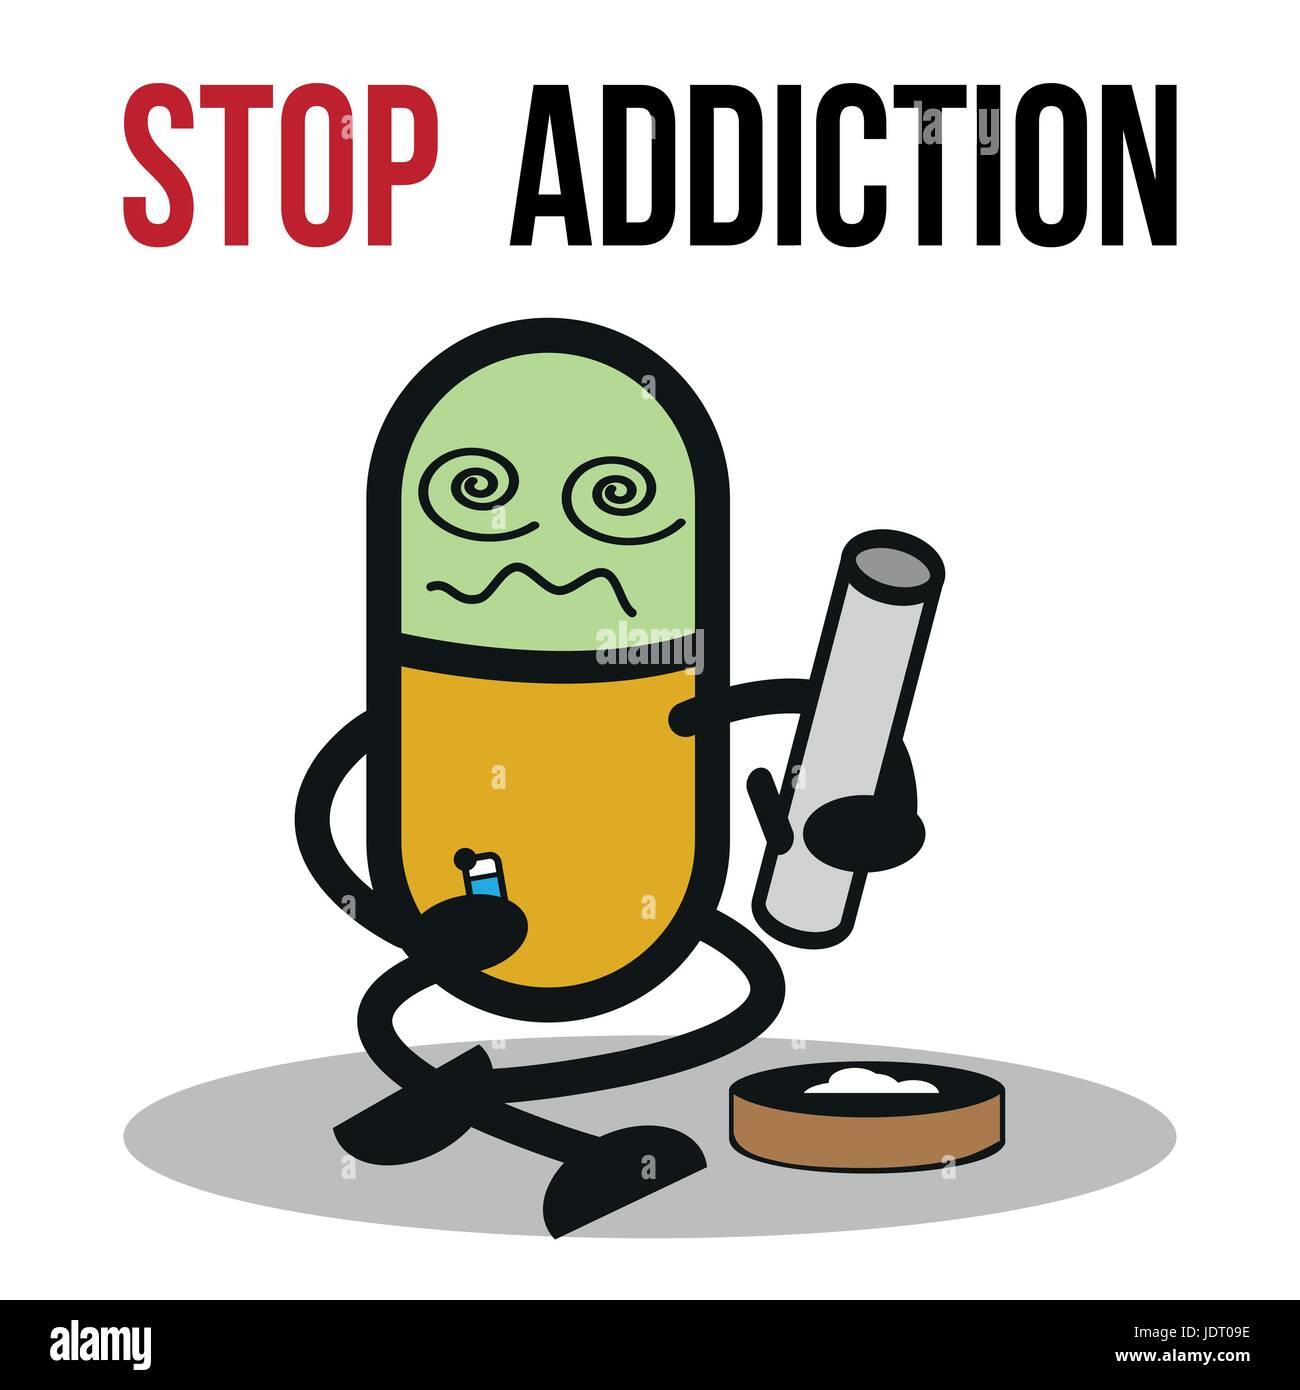 how do you stop an addiction